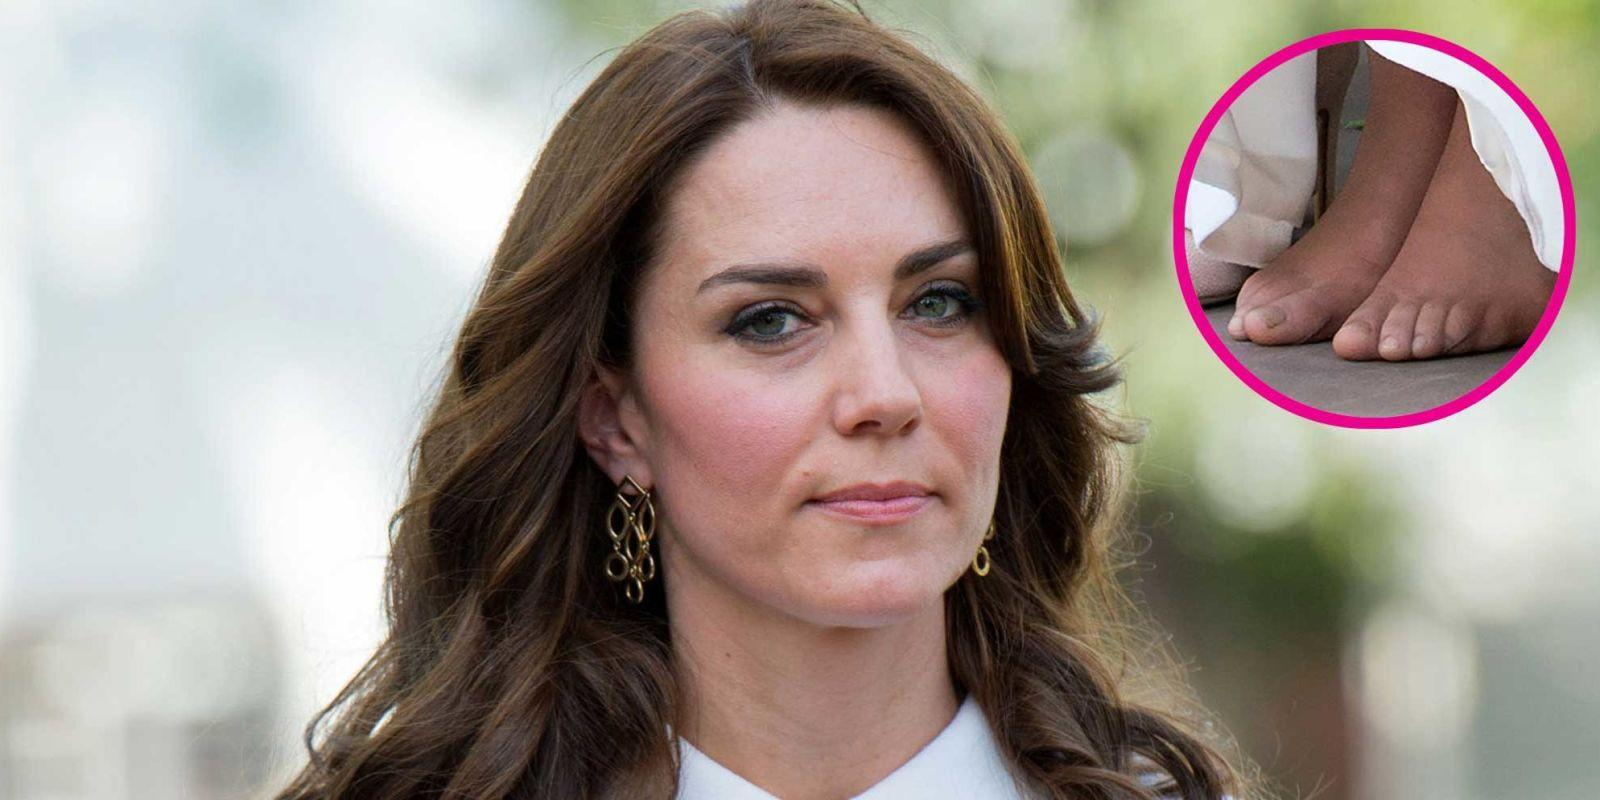 Can You Id Kate Middleton Kate Middleton Makeup Popsugar